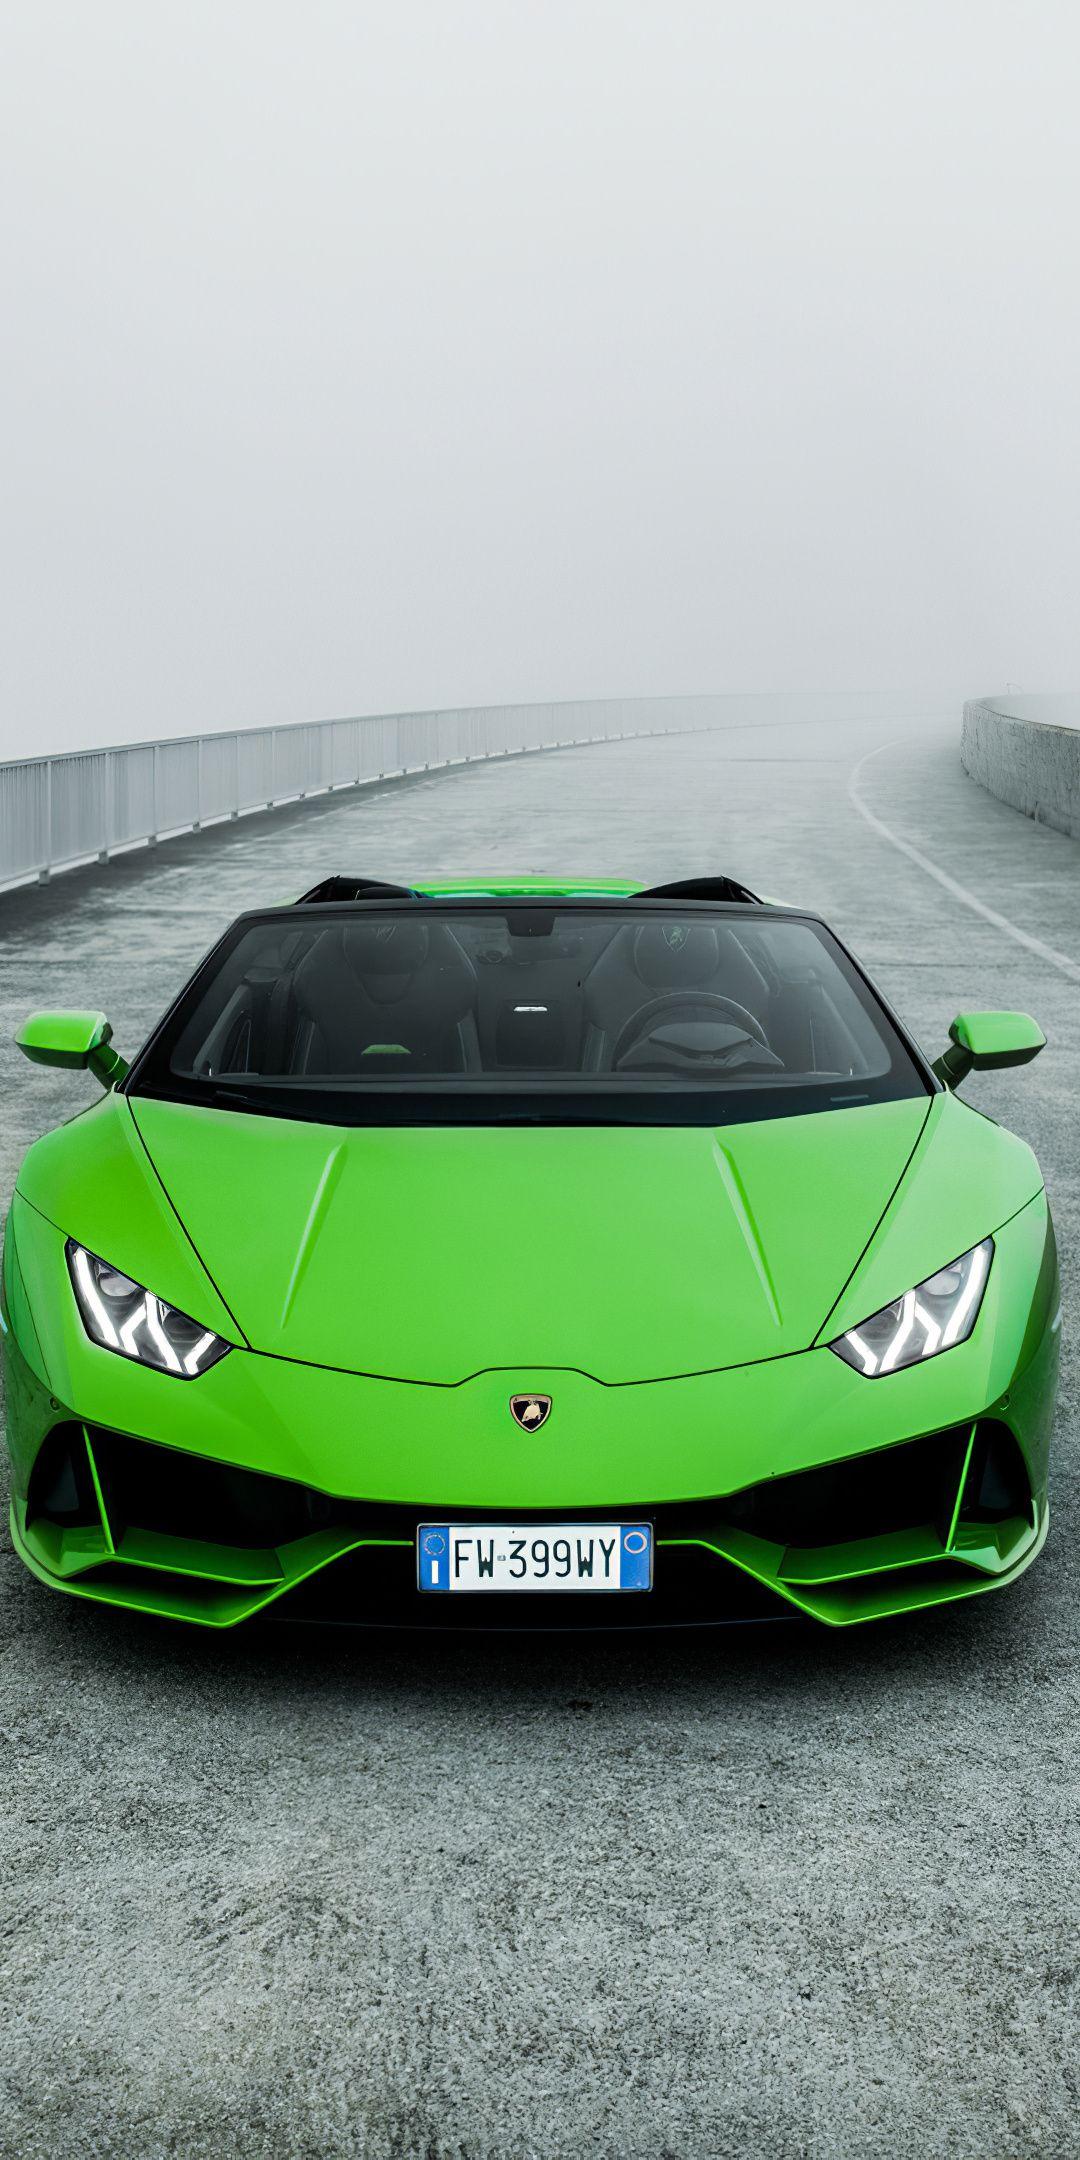 1080x2160 Lamborghini Huracan Evo Spyder Green Car 2020 Wallpaper Car Wallpapers Lamborghini Lamborghini Huracan